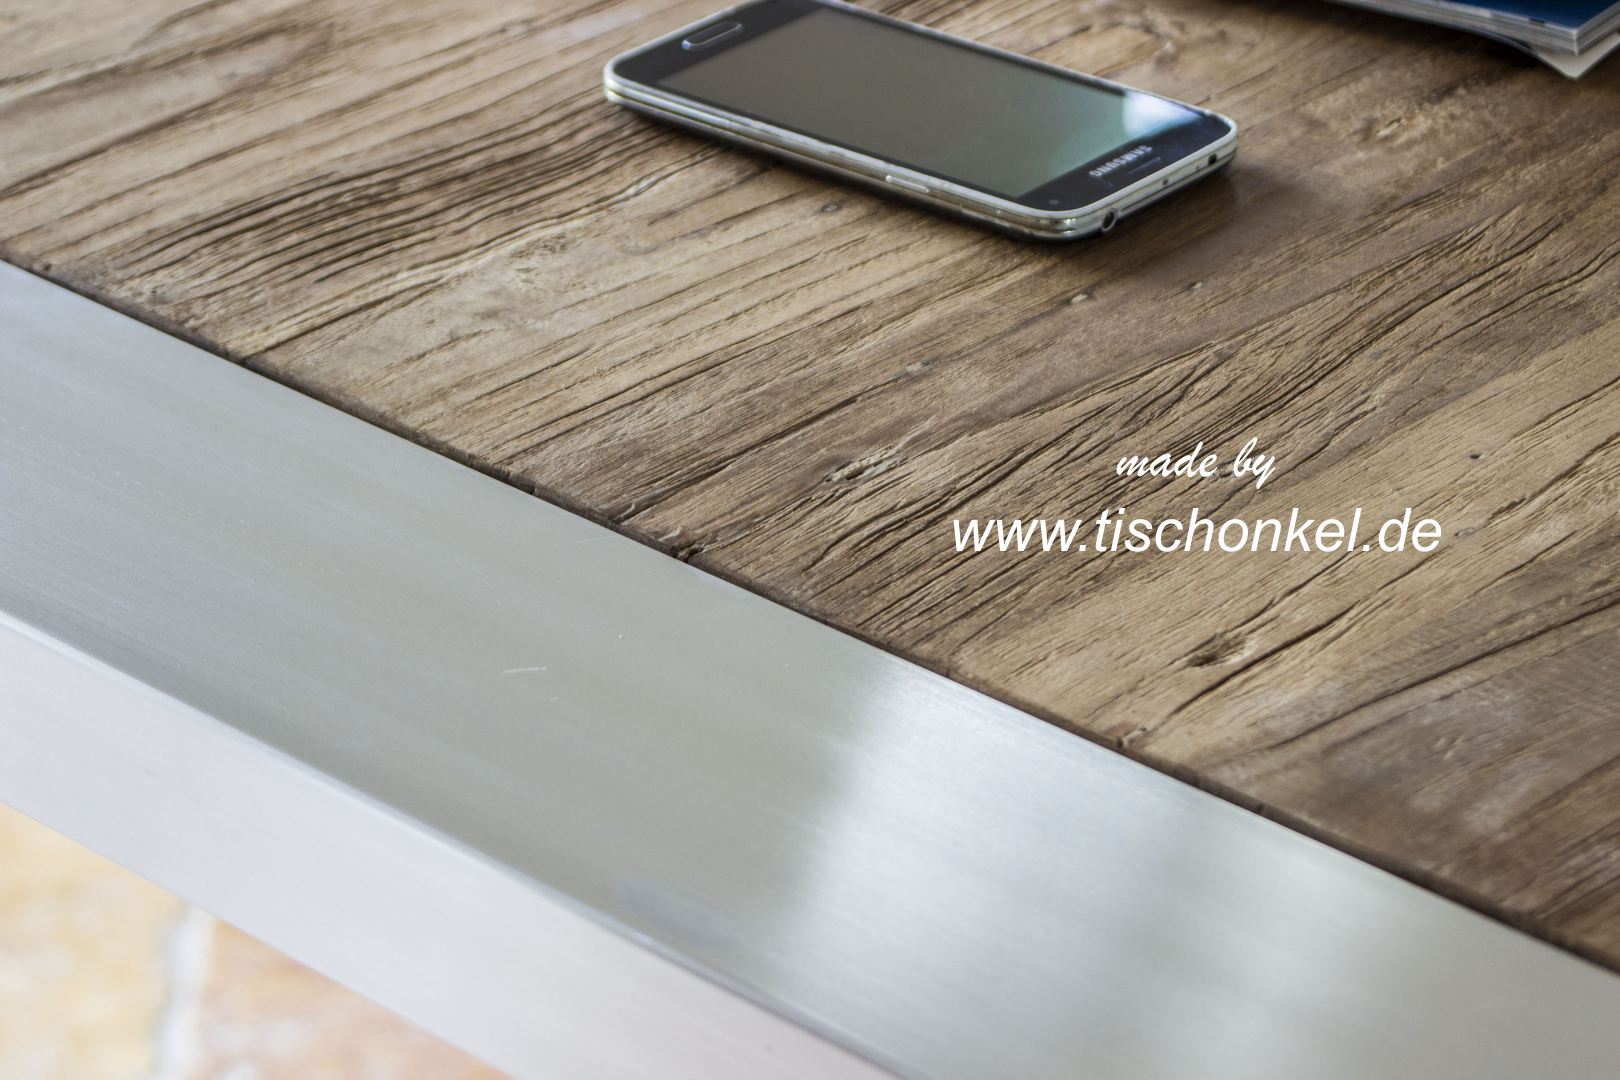 esstisch aus recyceltem holz mit edelstahl der tischonkel. Black Bedroom Furniture Sets. Home Design Ideas